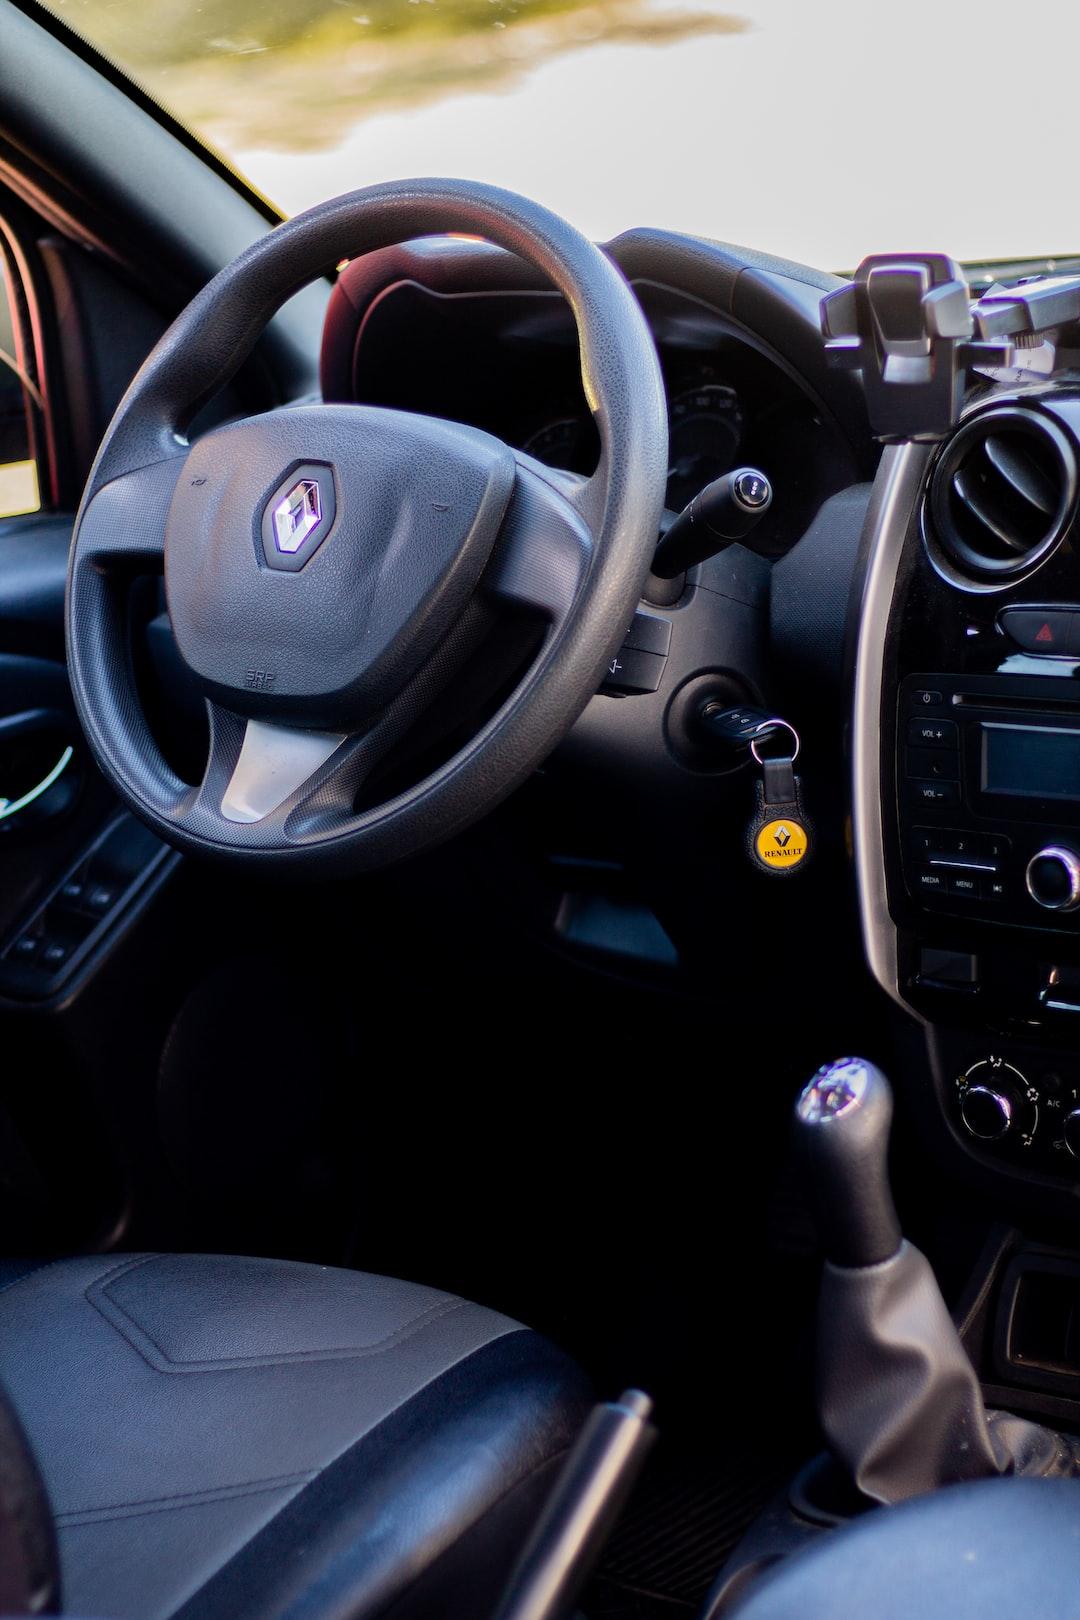 interior of a renault oroch car